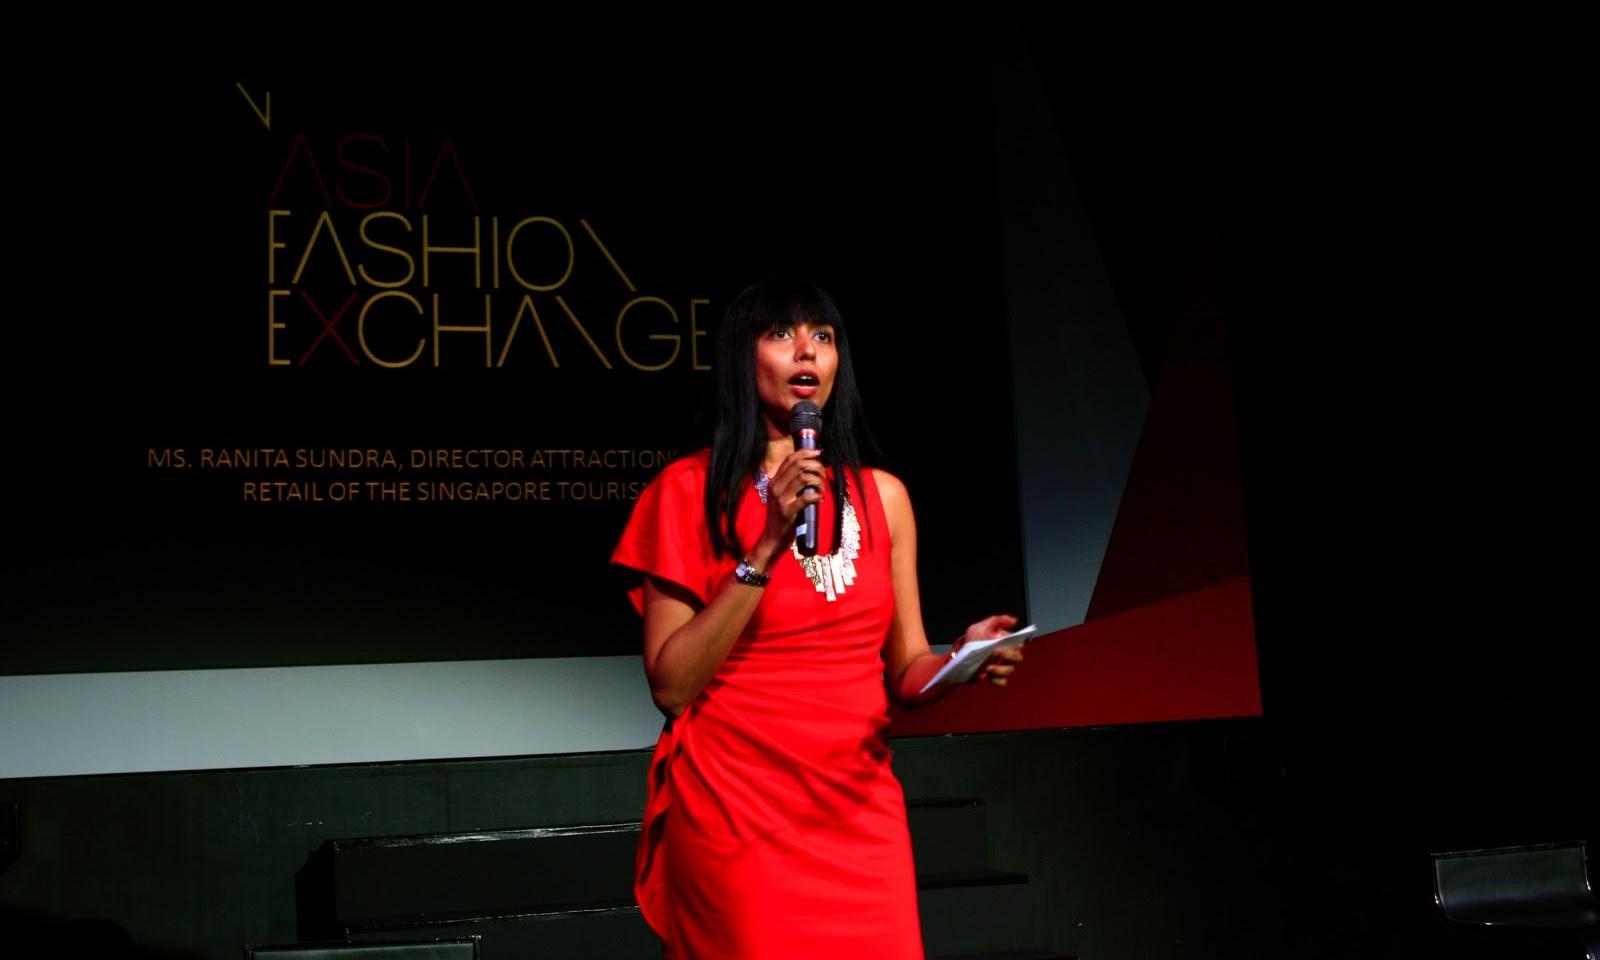 Asia Fashion Exchange Press Conference